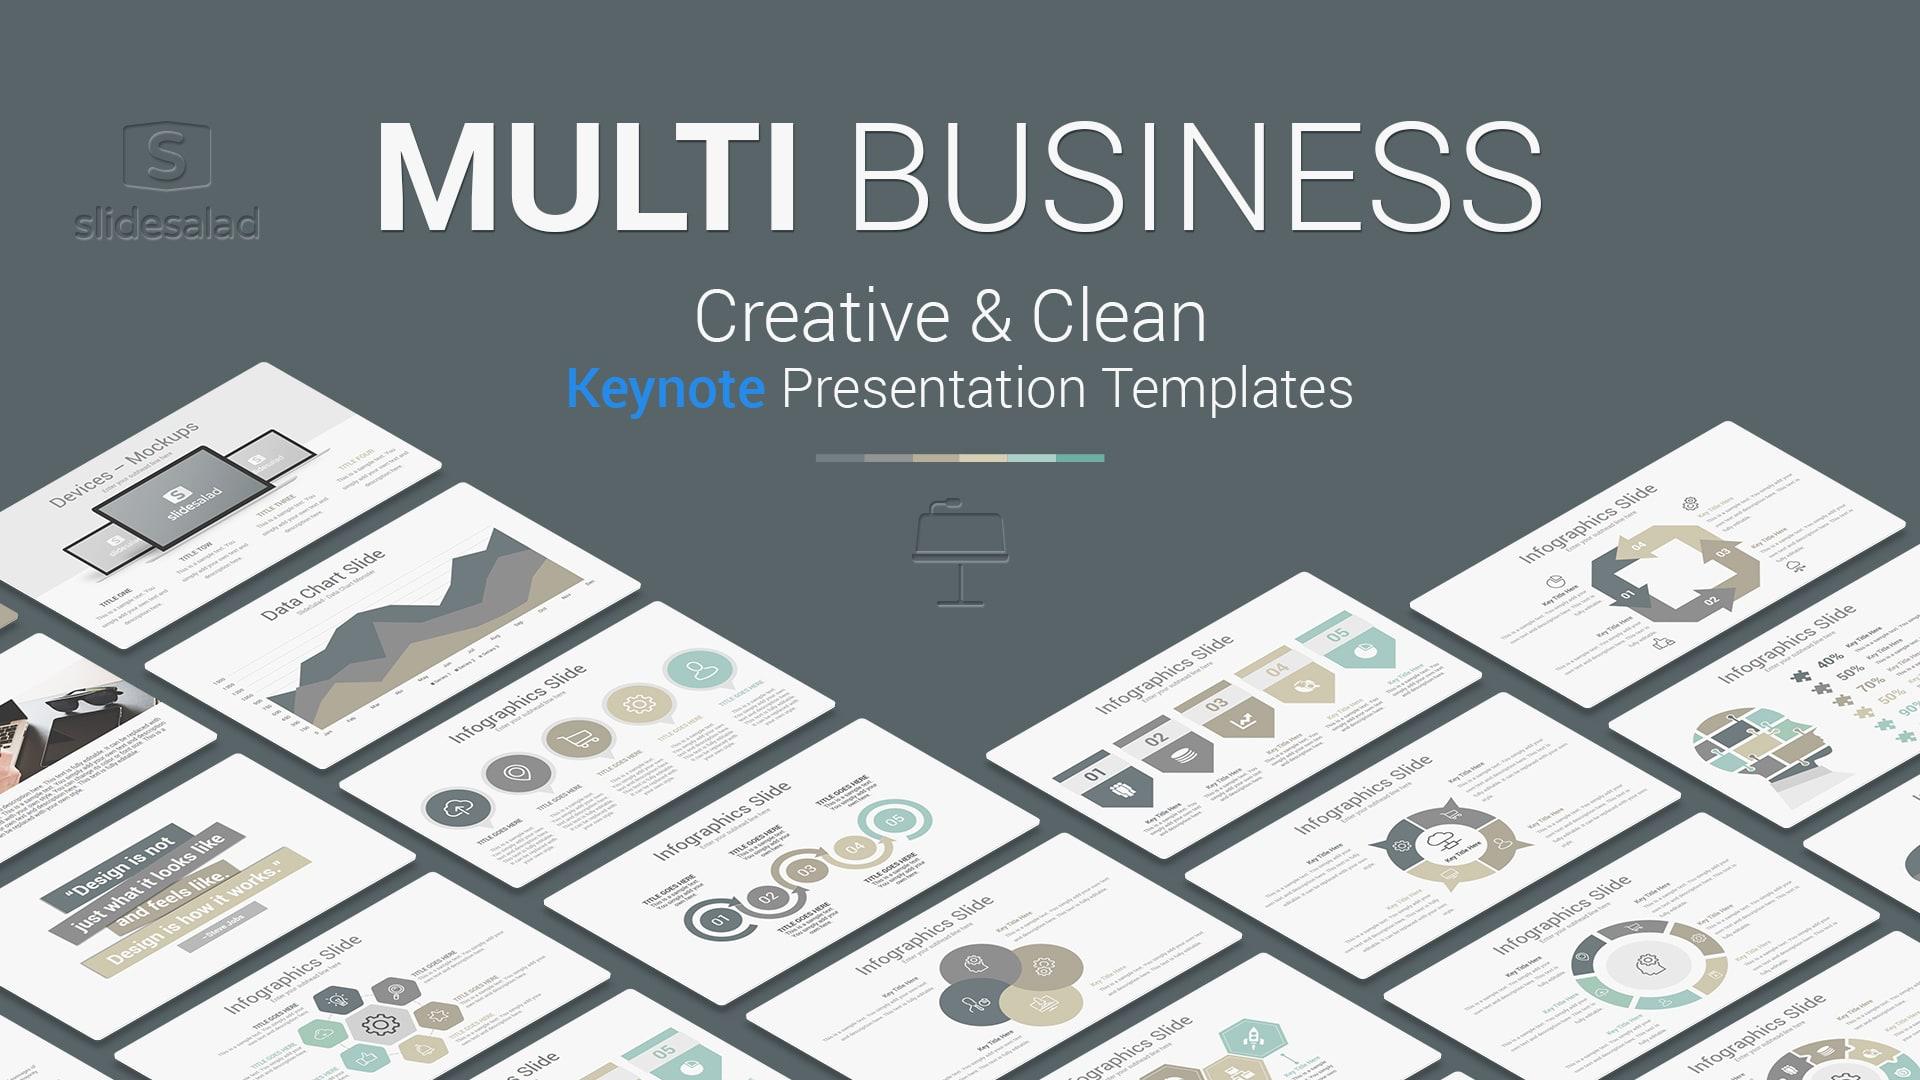 Multi Business Keynote Presentation Template – Multipurpose Business Presentation Template for Apple Keynote